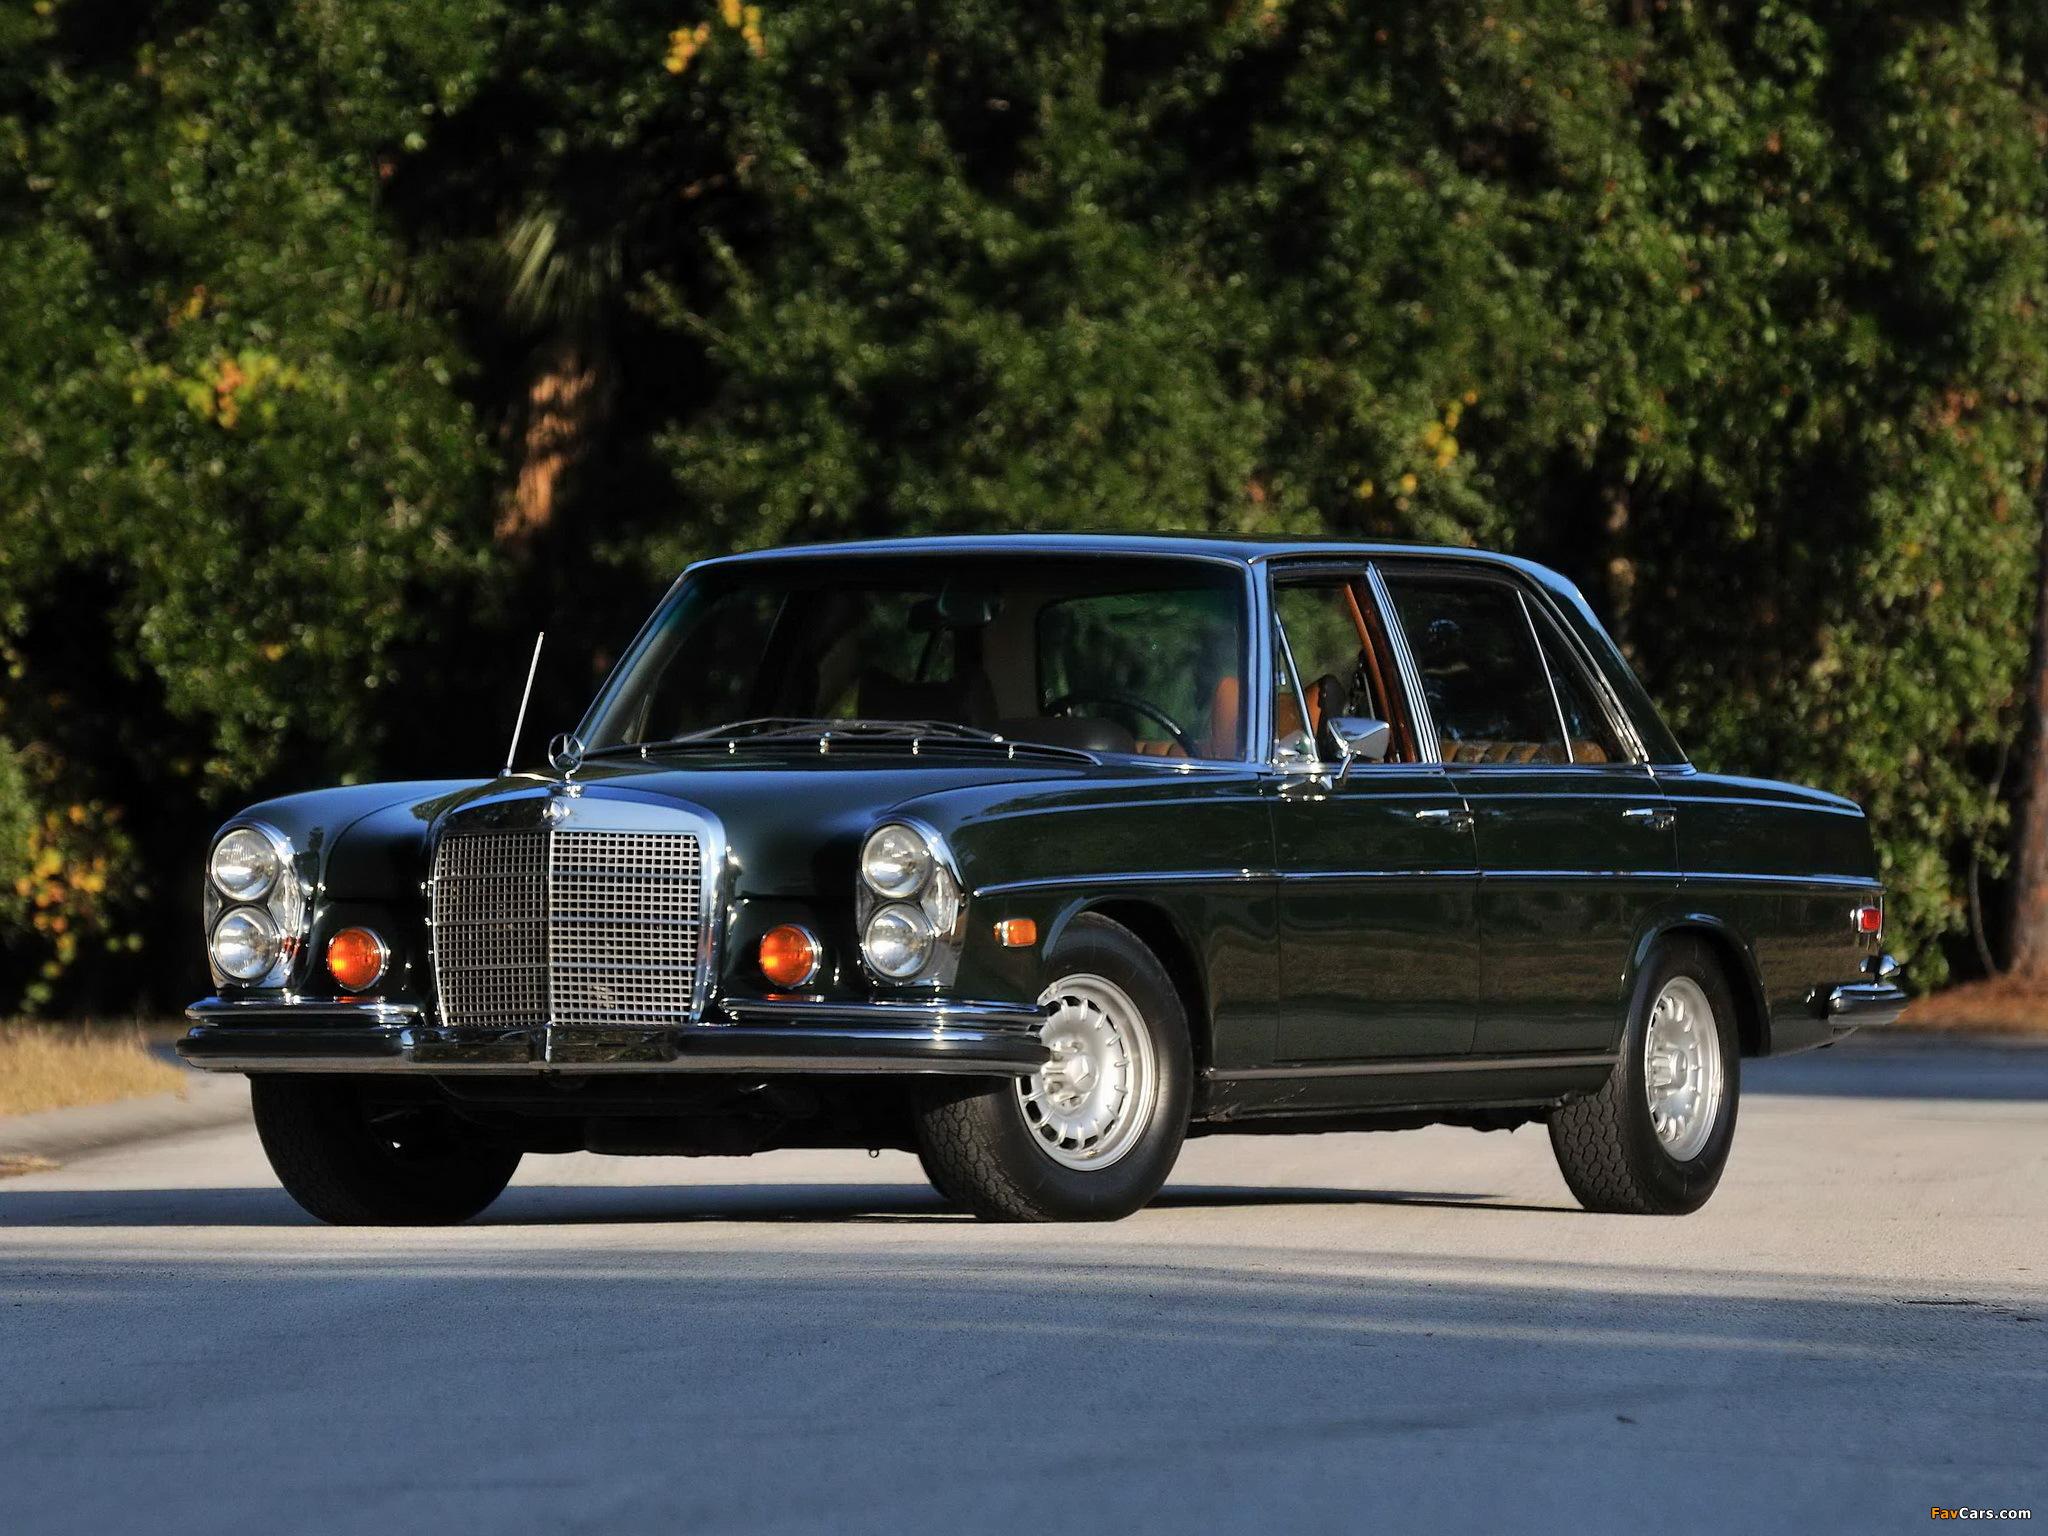 50 godina Mercedesove legende